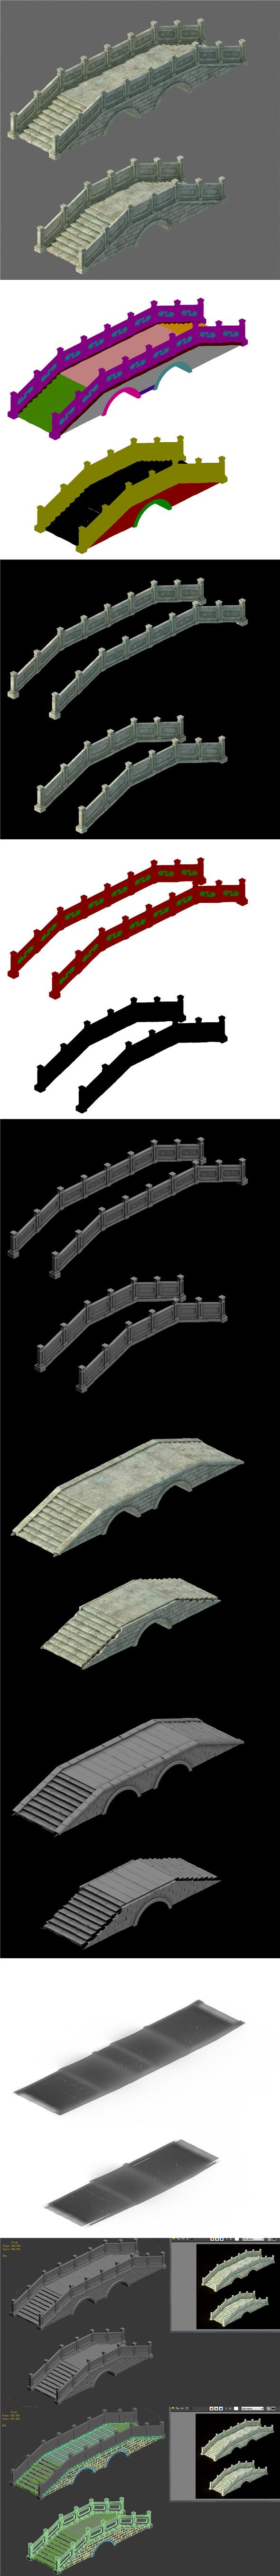 Ancient architecture - stone bridge - 3DOcean Item for Sale